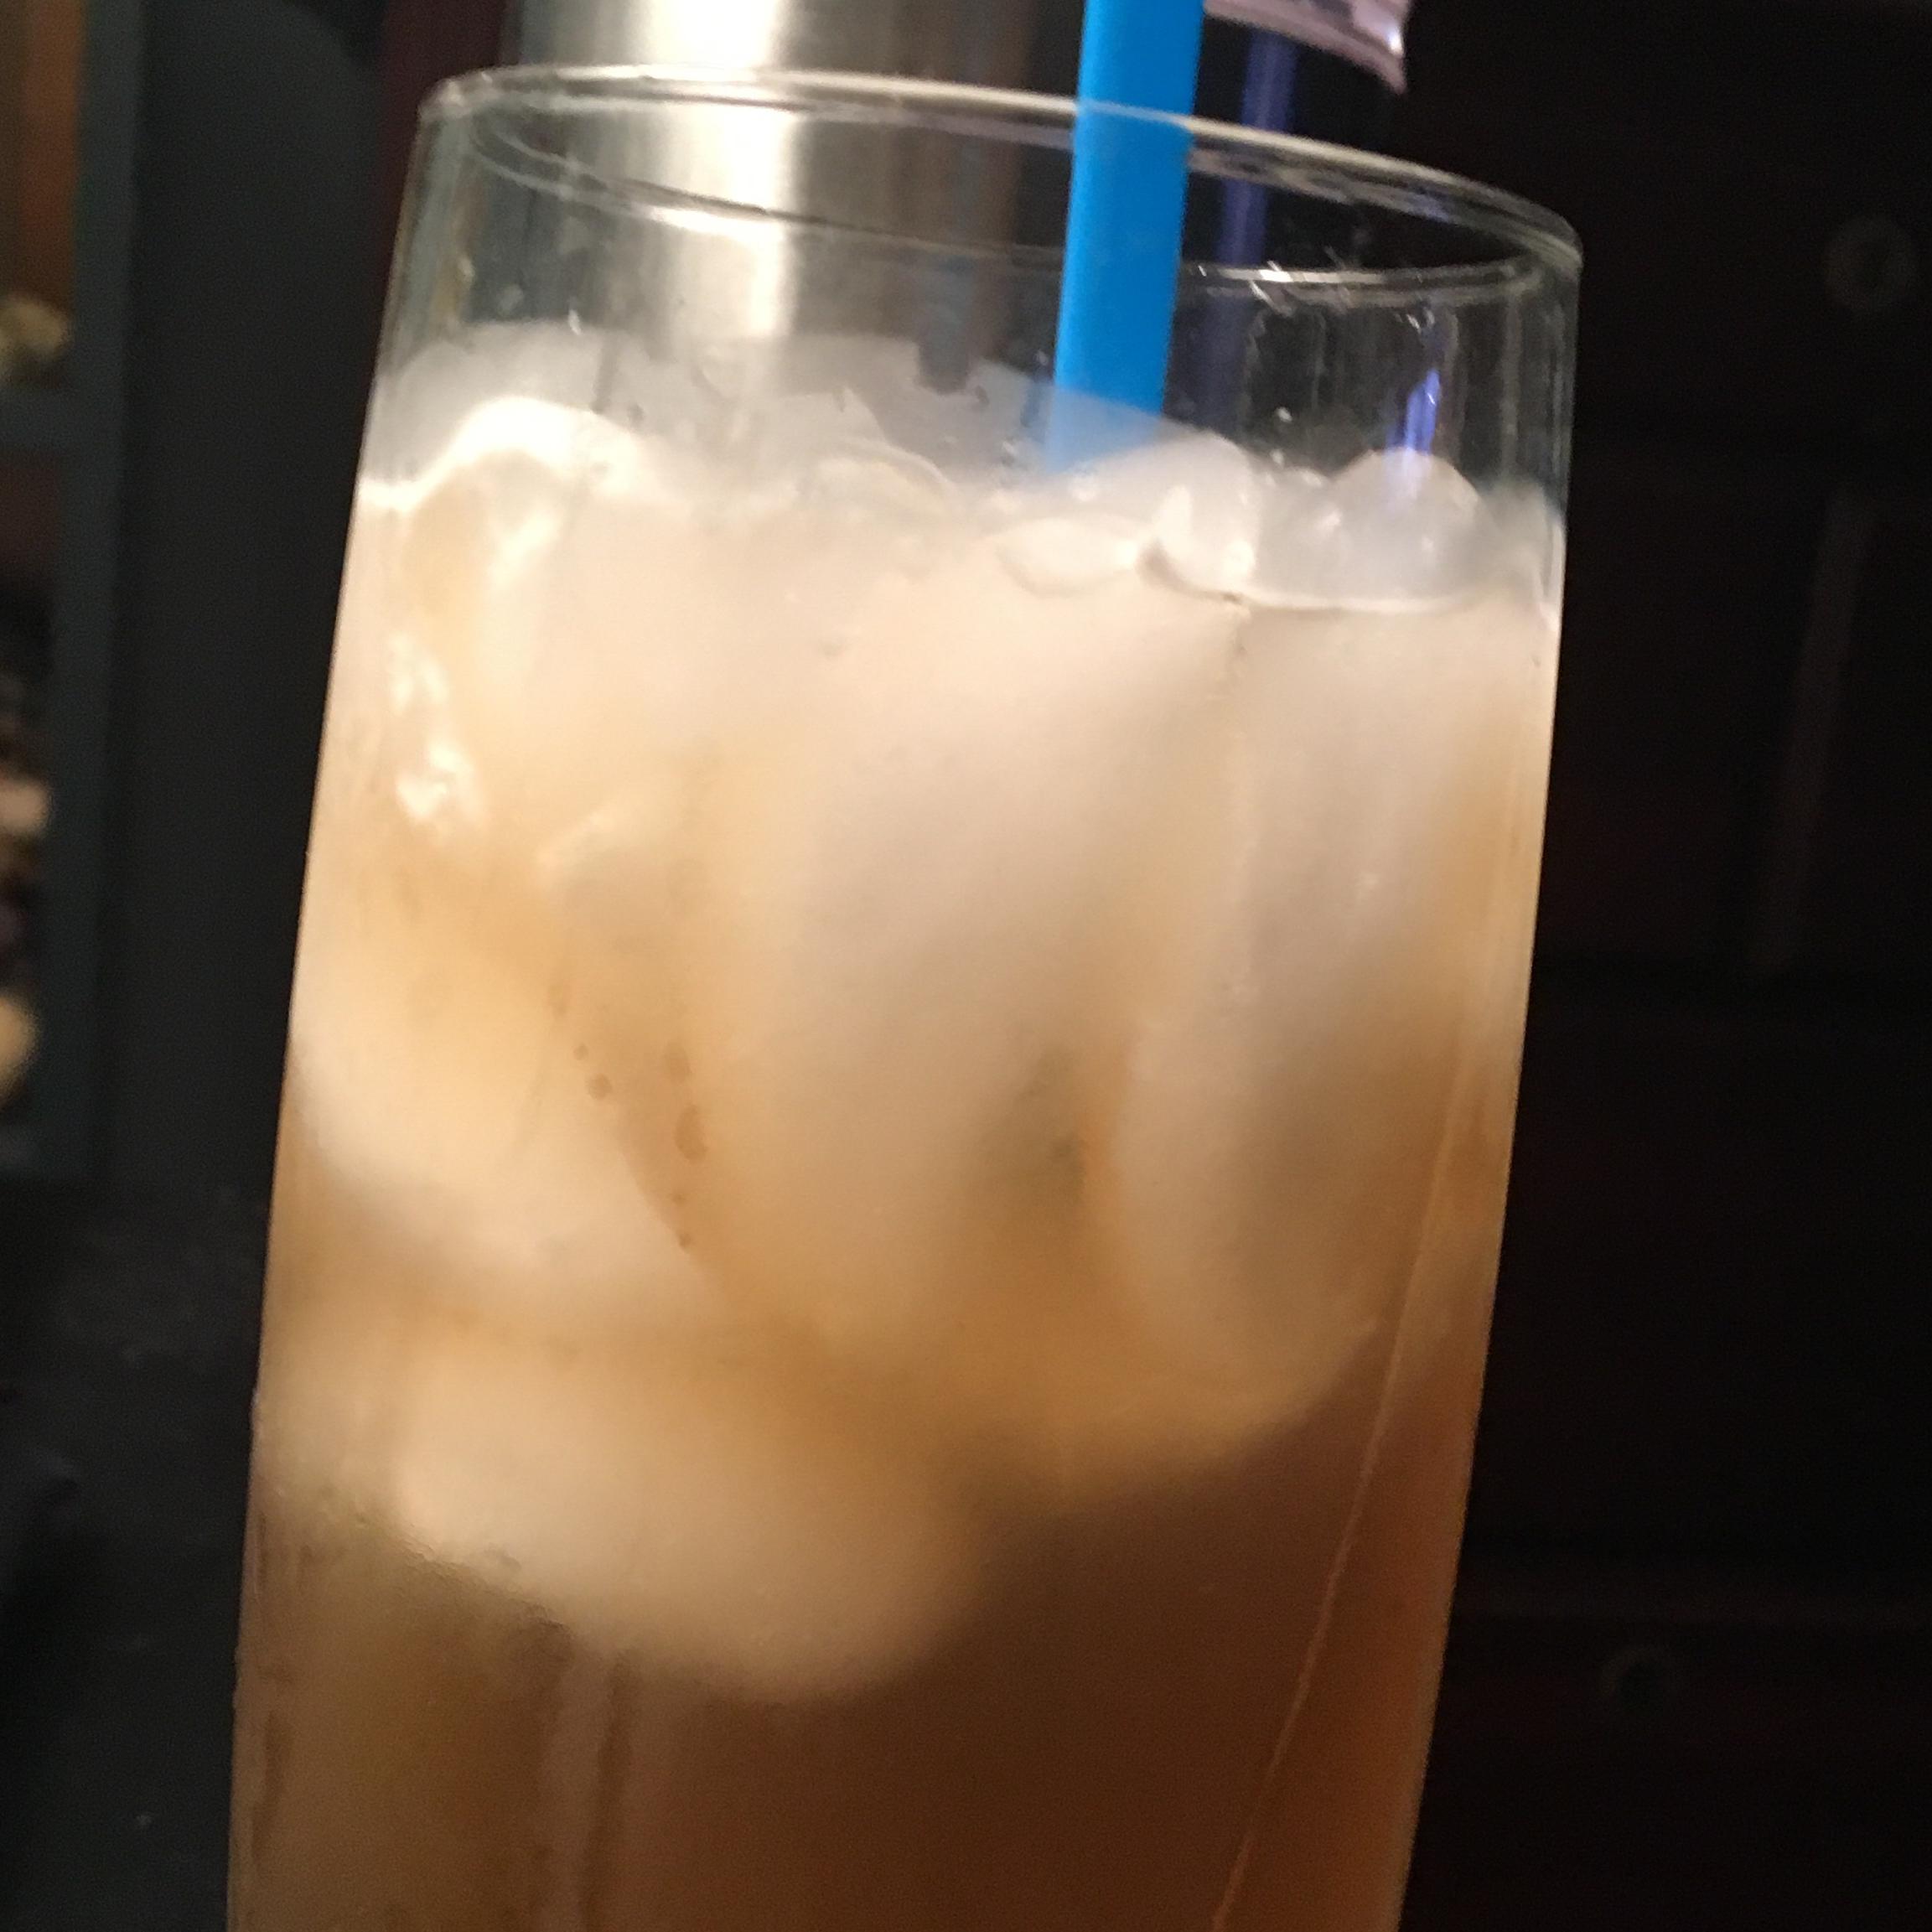 The REAL Long Island Iced Tea Cookie girl